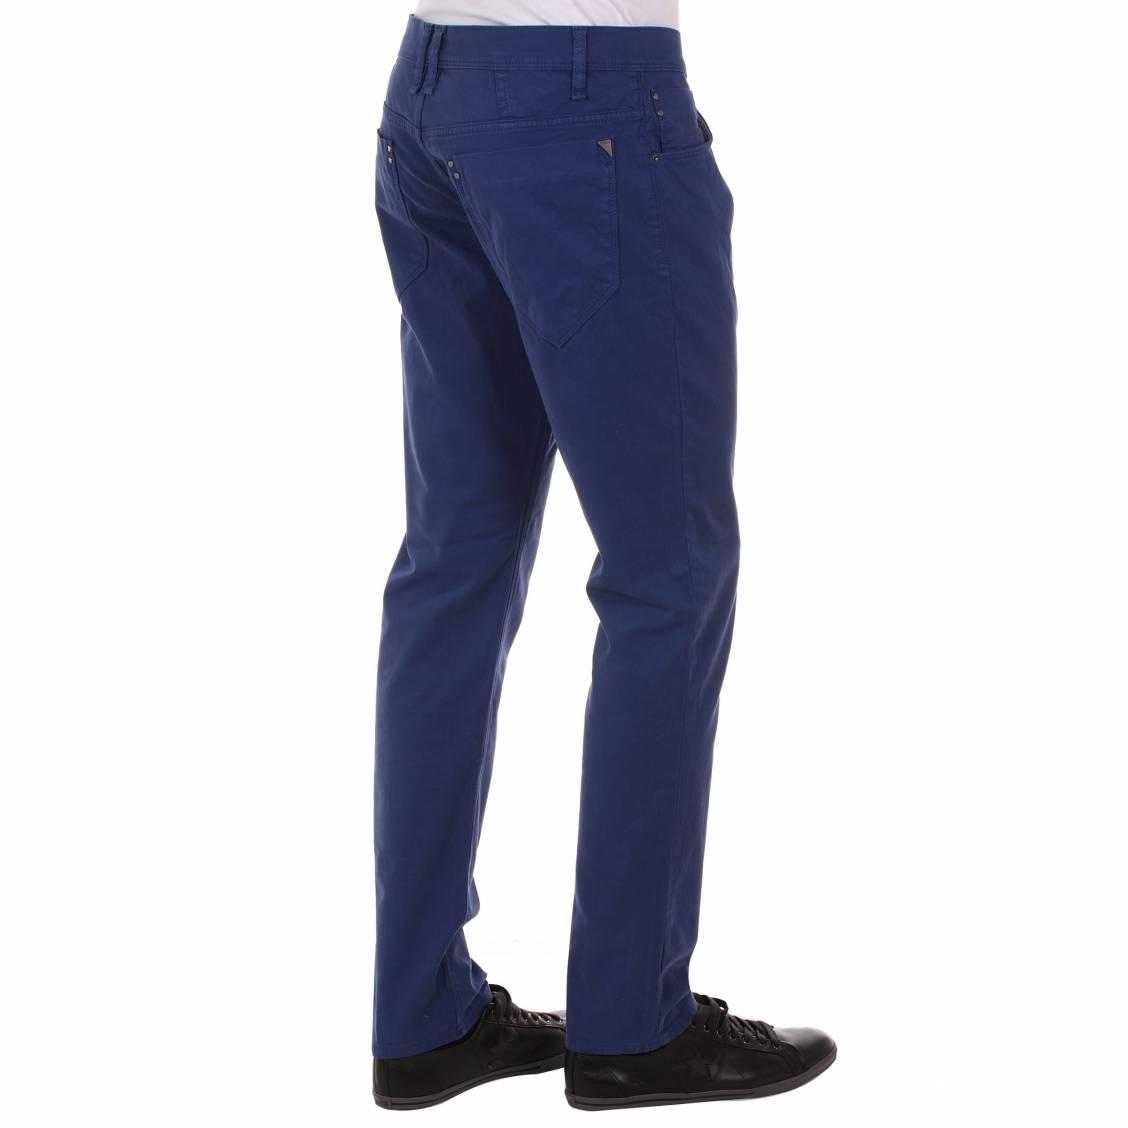 pantalon cintr antony morato en coton bleu roi rue des hommes. Black Bedroom Furniture Sets. Home Design Ideas